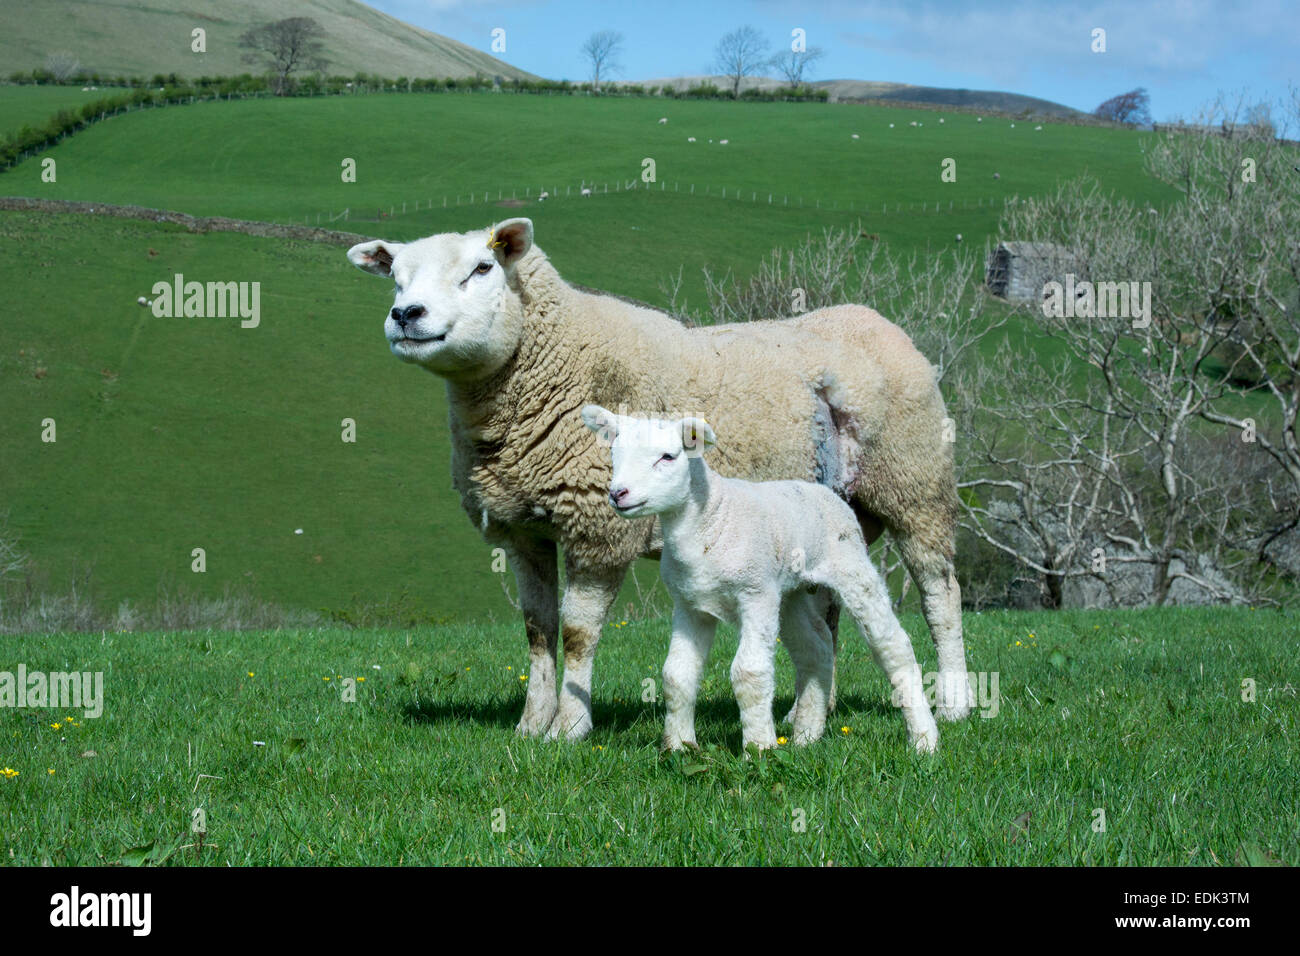 Texel ewe with lamb. The ewe has had a cesarean. Cumbria, UK - Stock Image